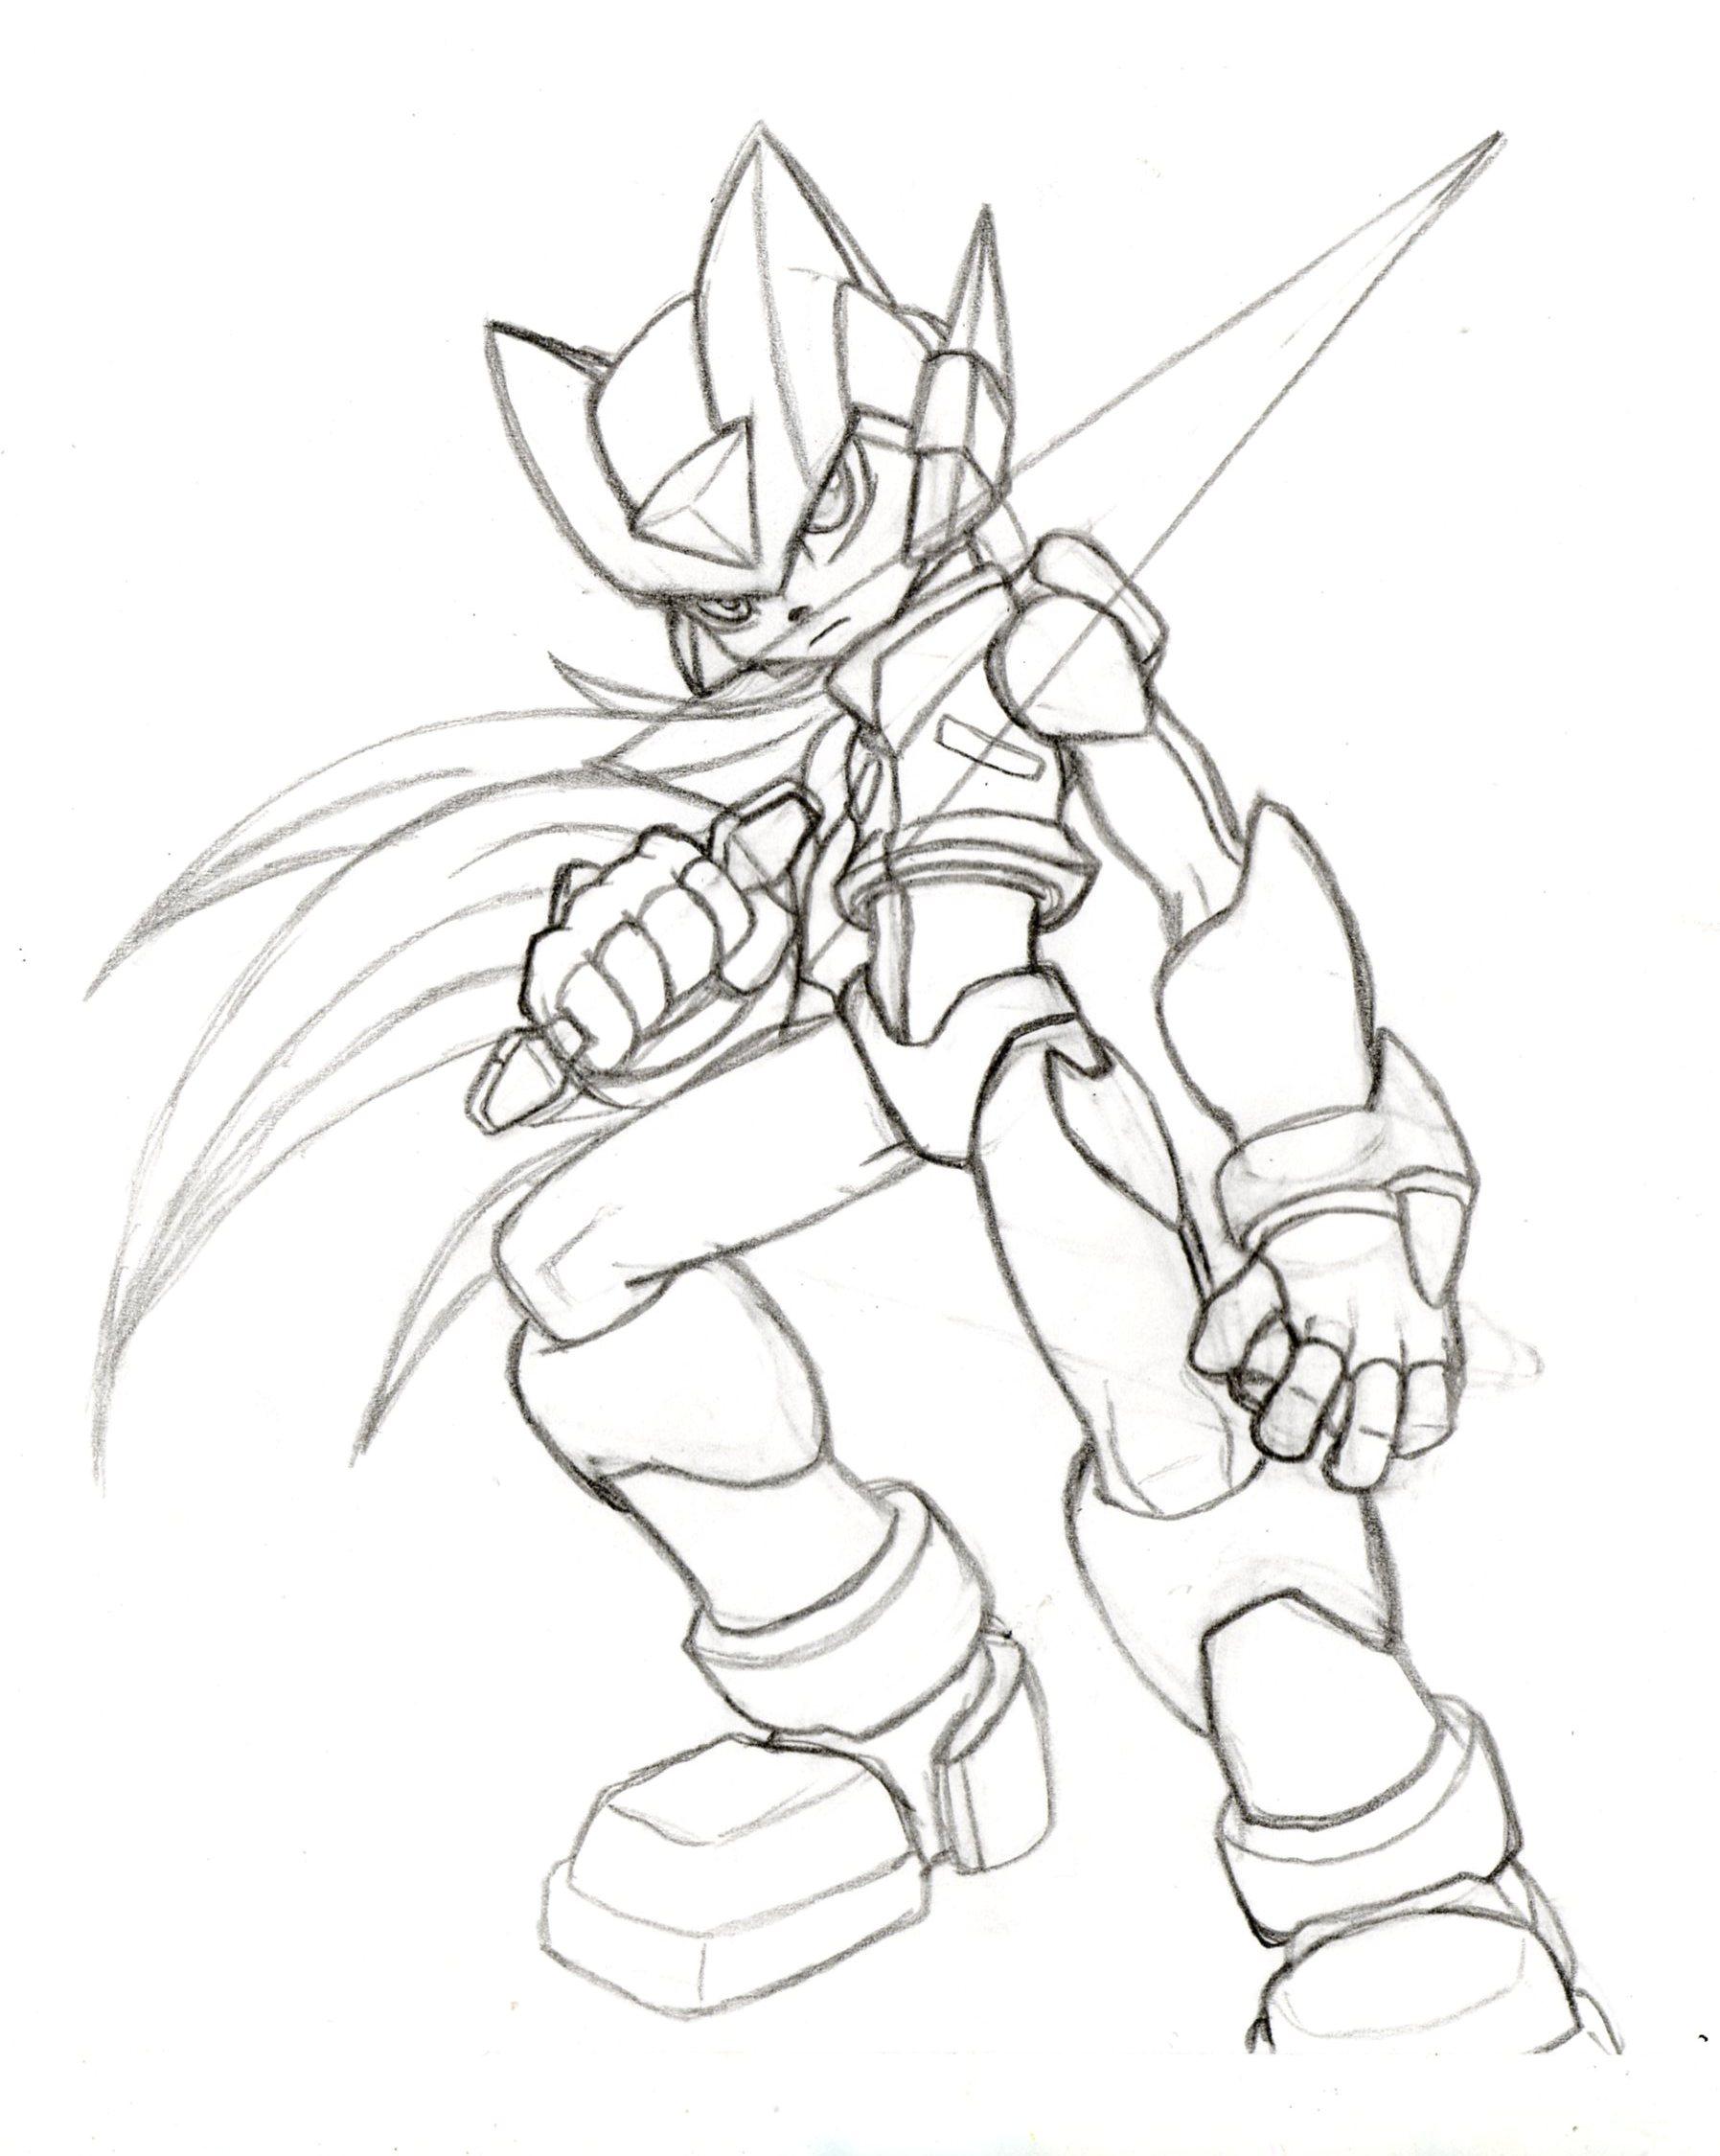 Line Art Zero : Megaman zero sketch preview by theatombomb on